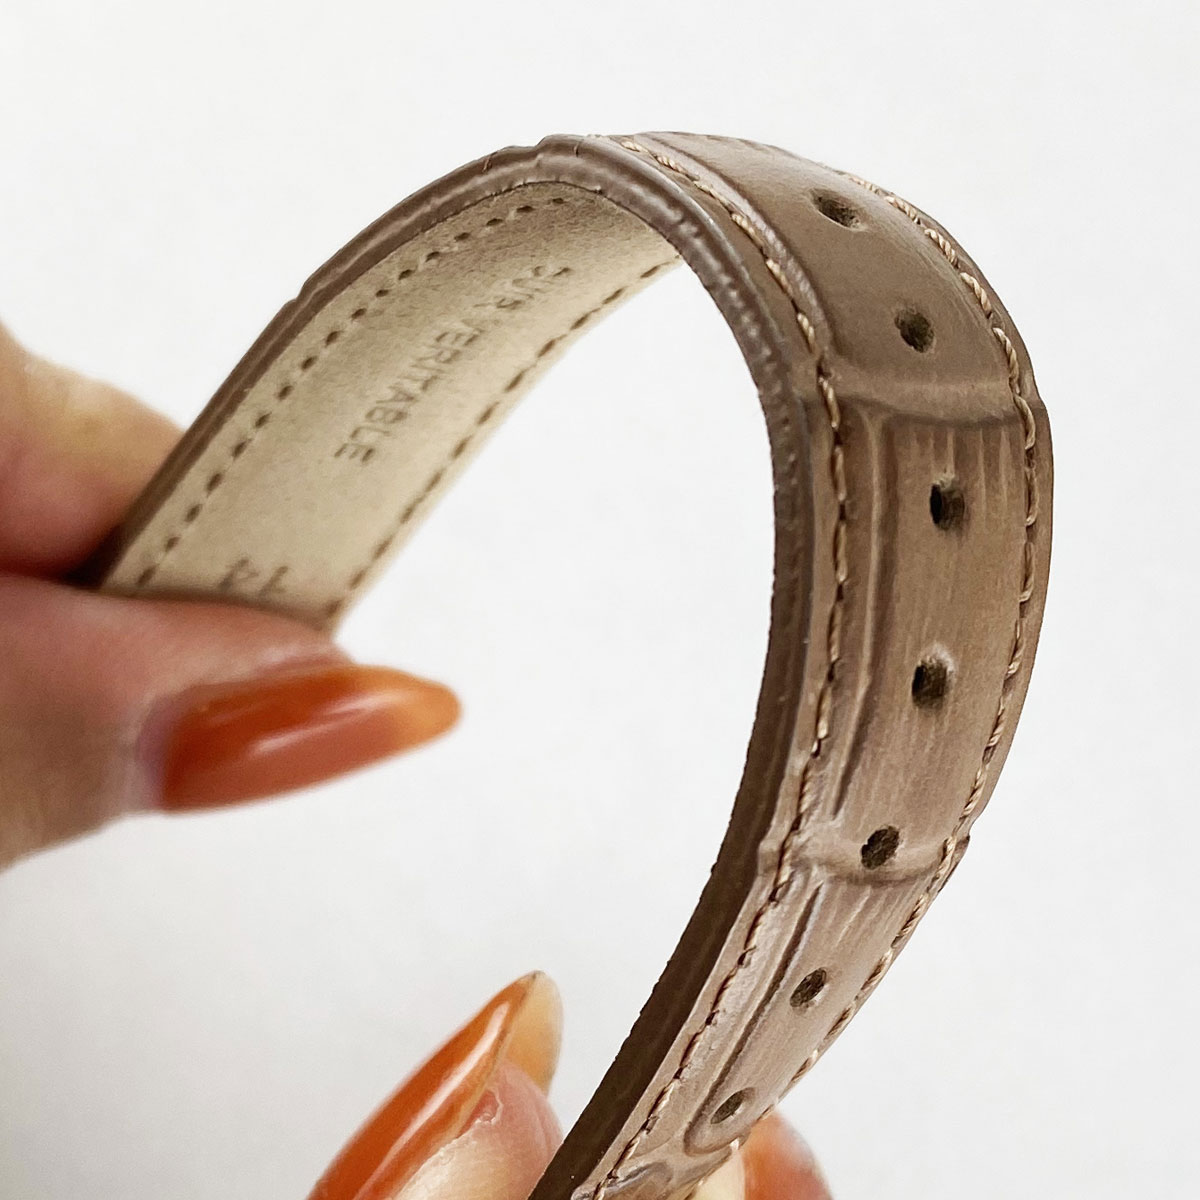 10mm 腕時計ベルト ノーブル 牛革クロコ型押しベルト